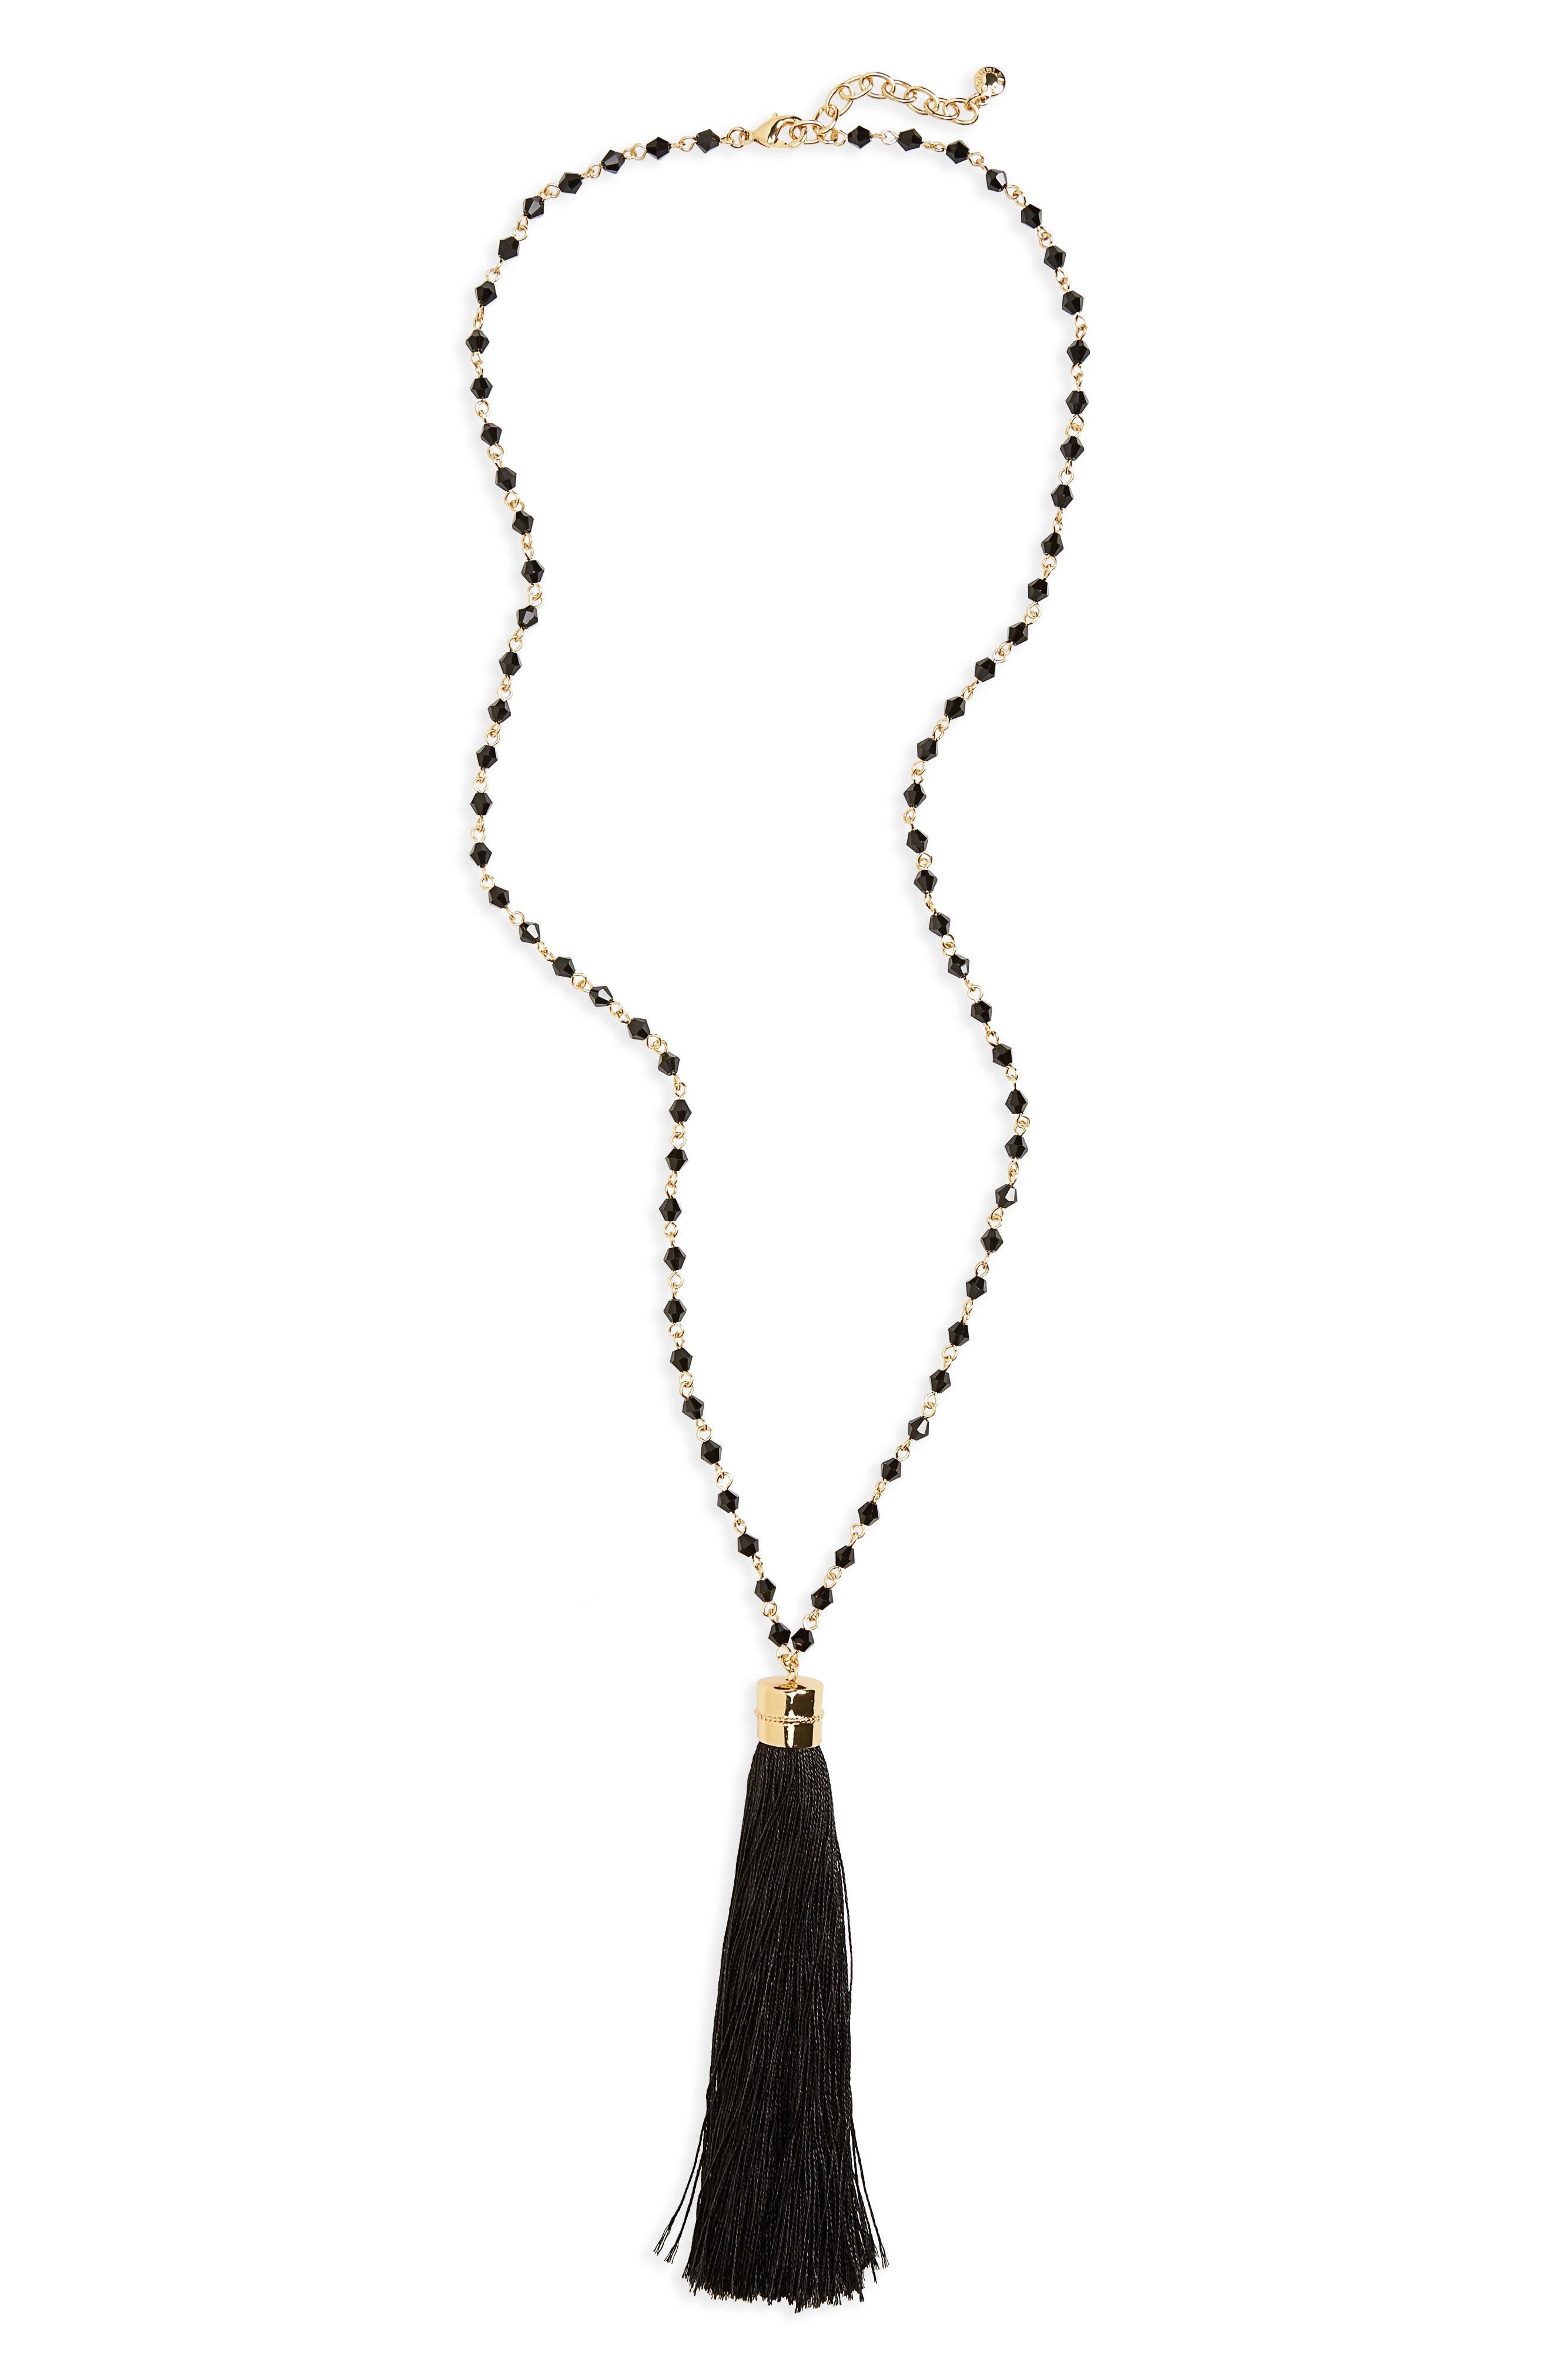 Tassel Necklace,                             Main thumbnail 1, color,                             Black